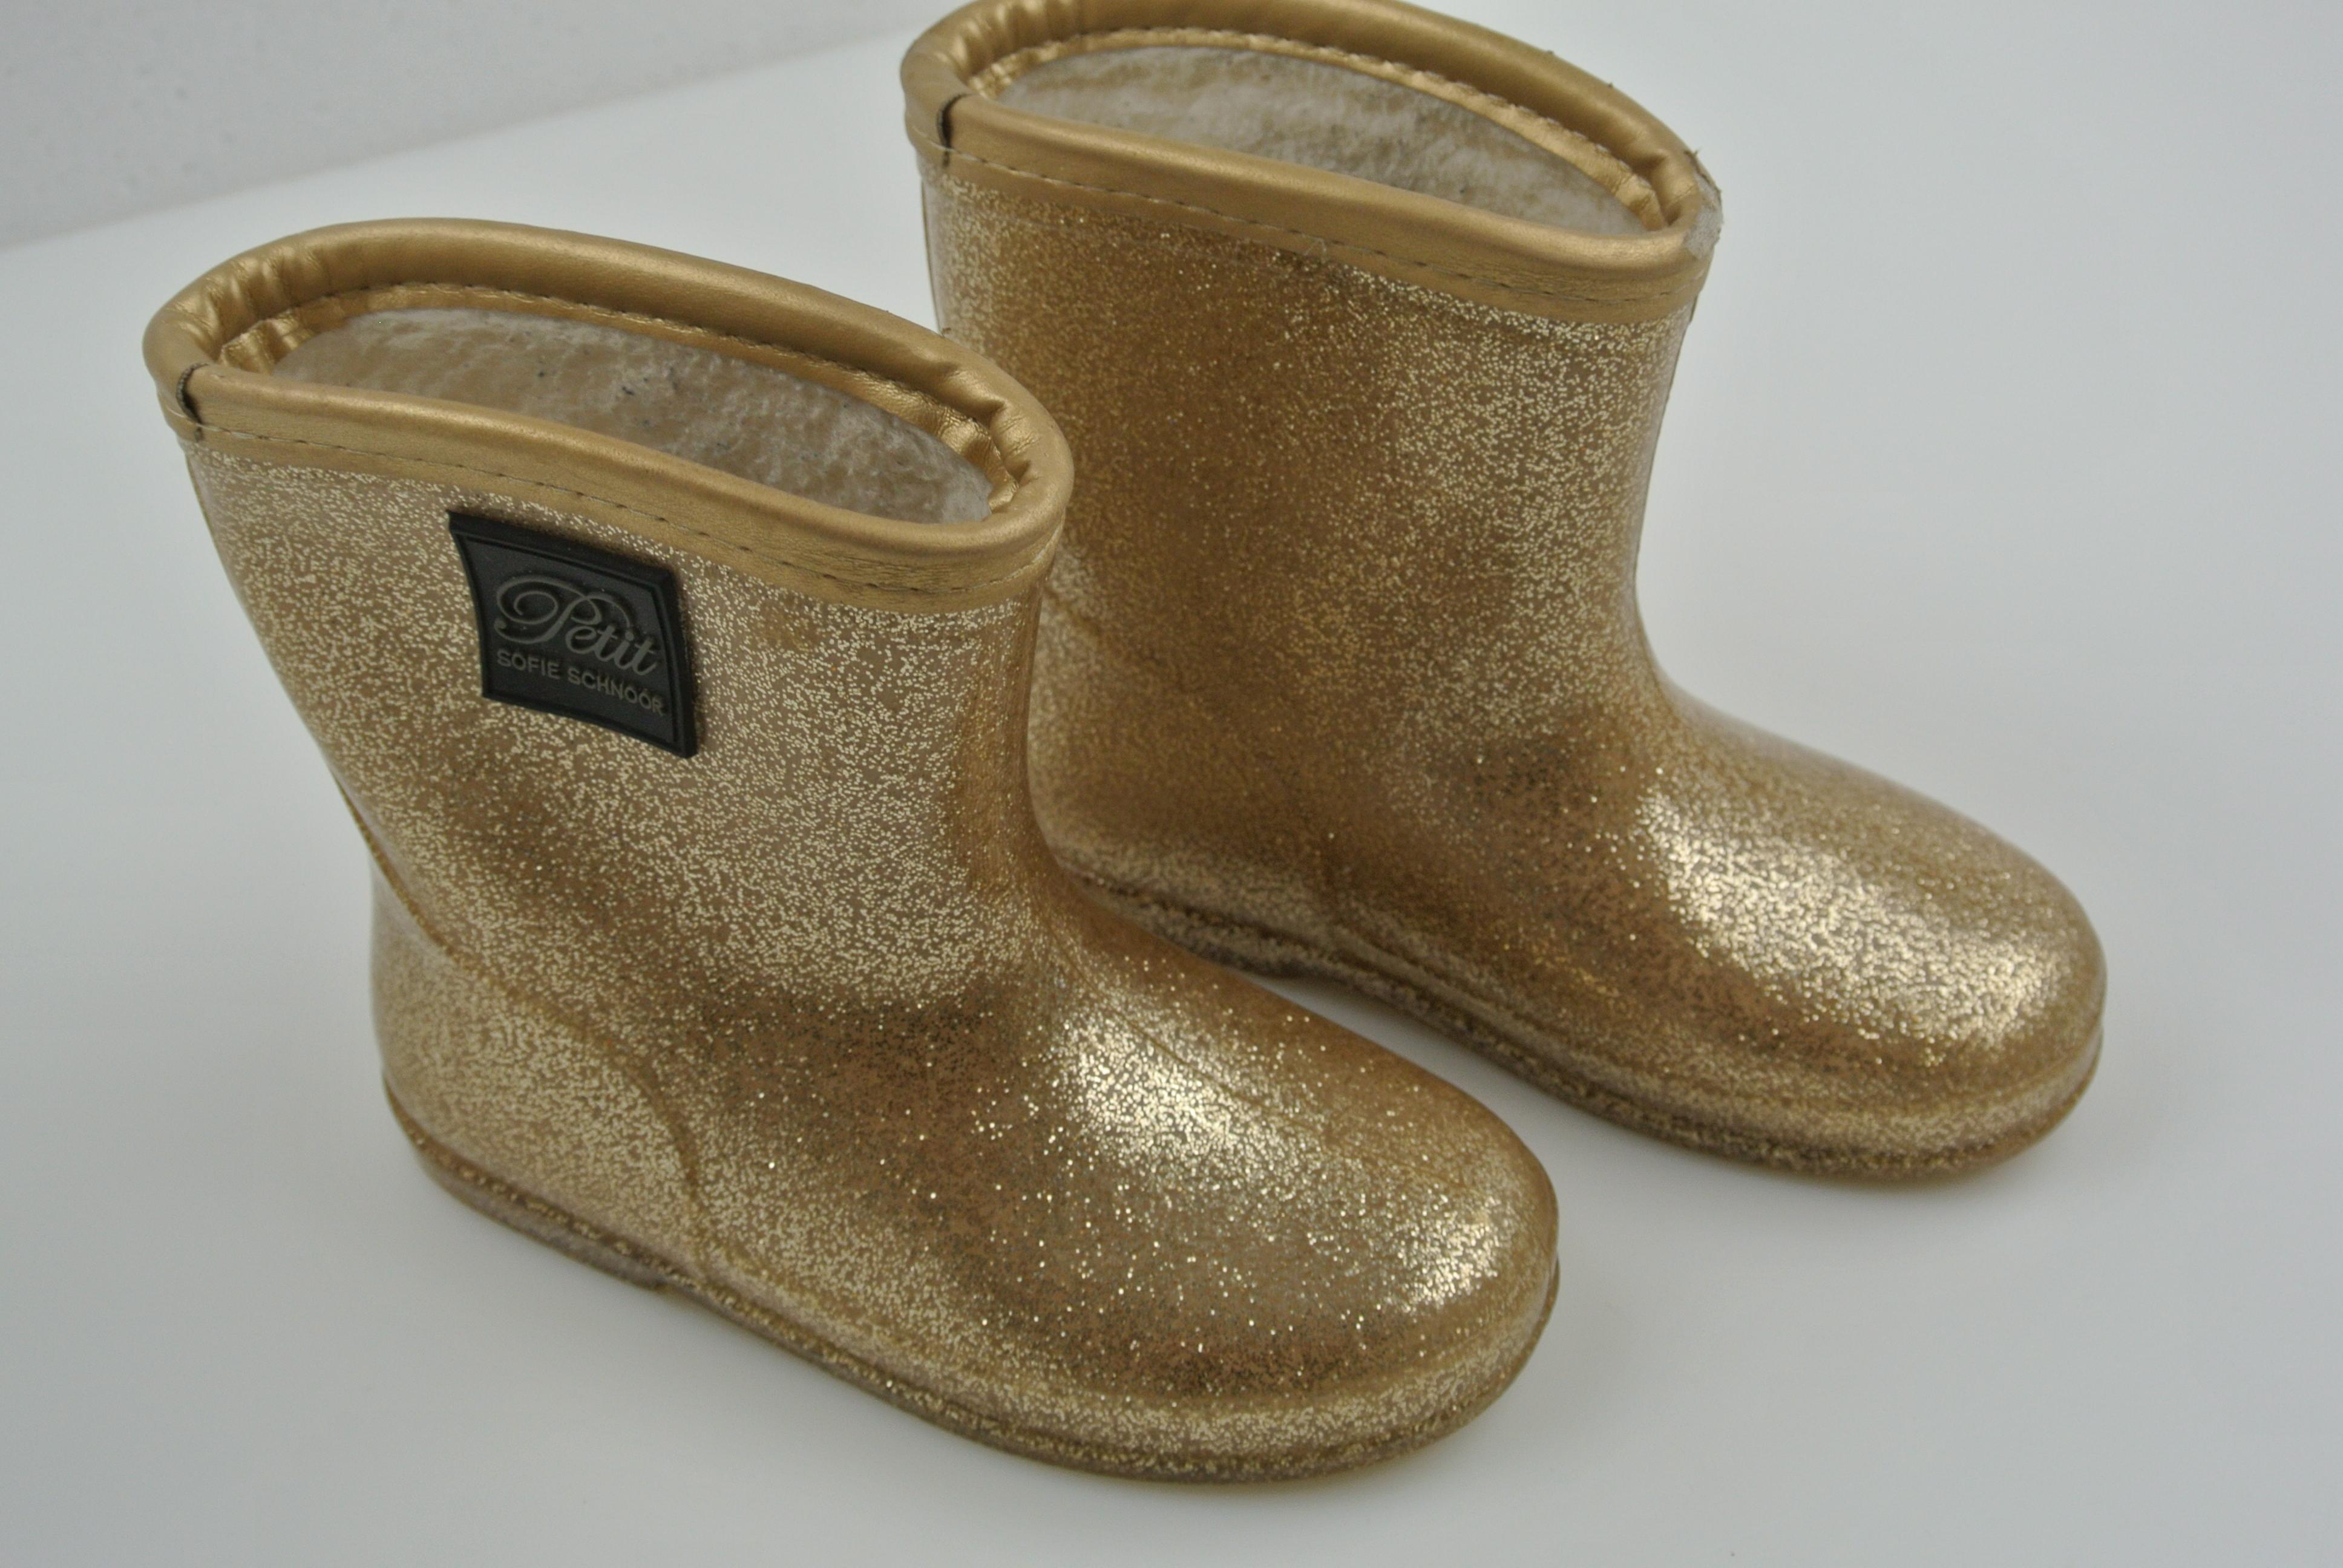 Petit by Sofie schnoor gummistøvler str 24 sko